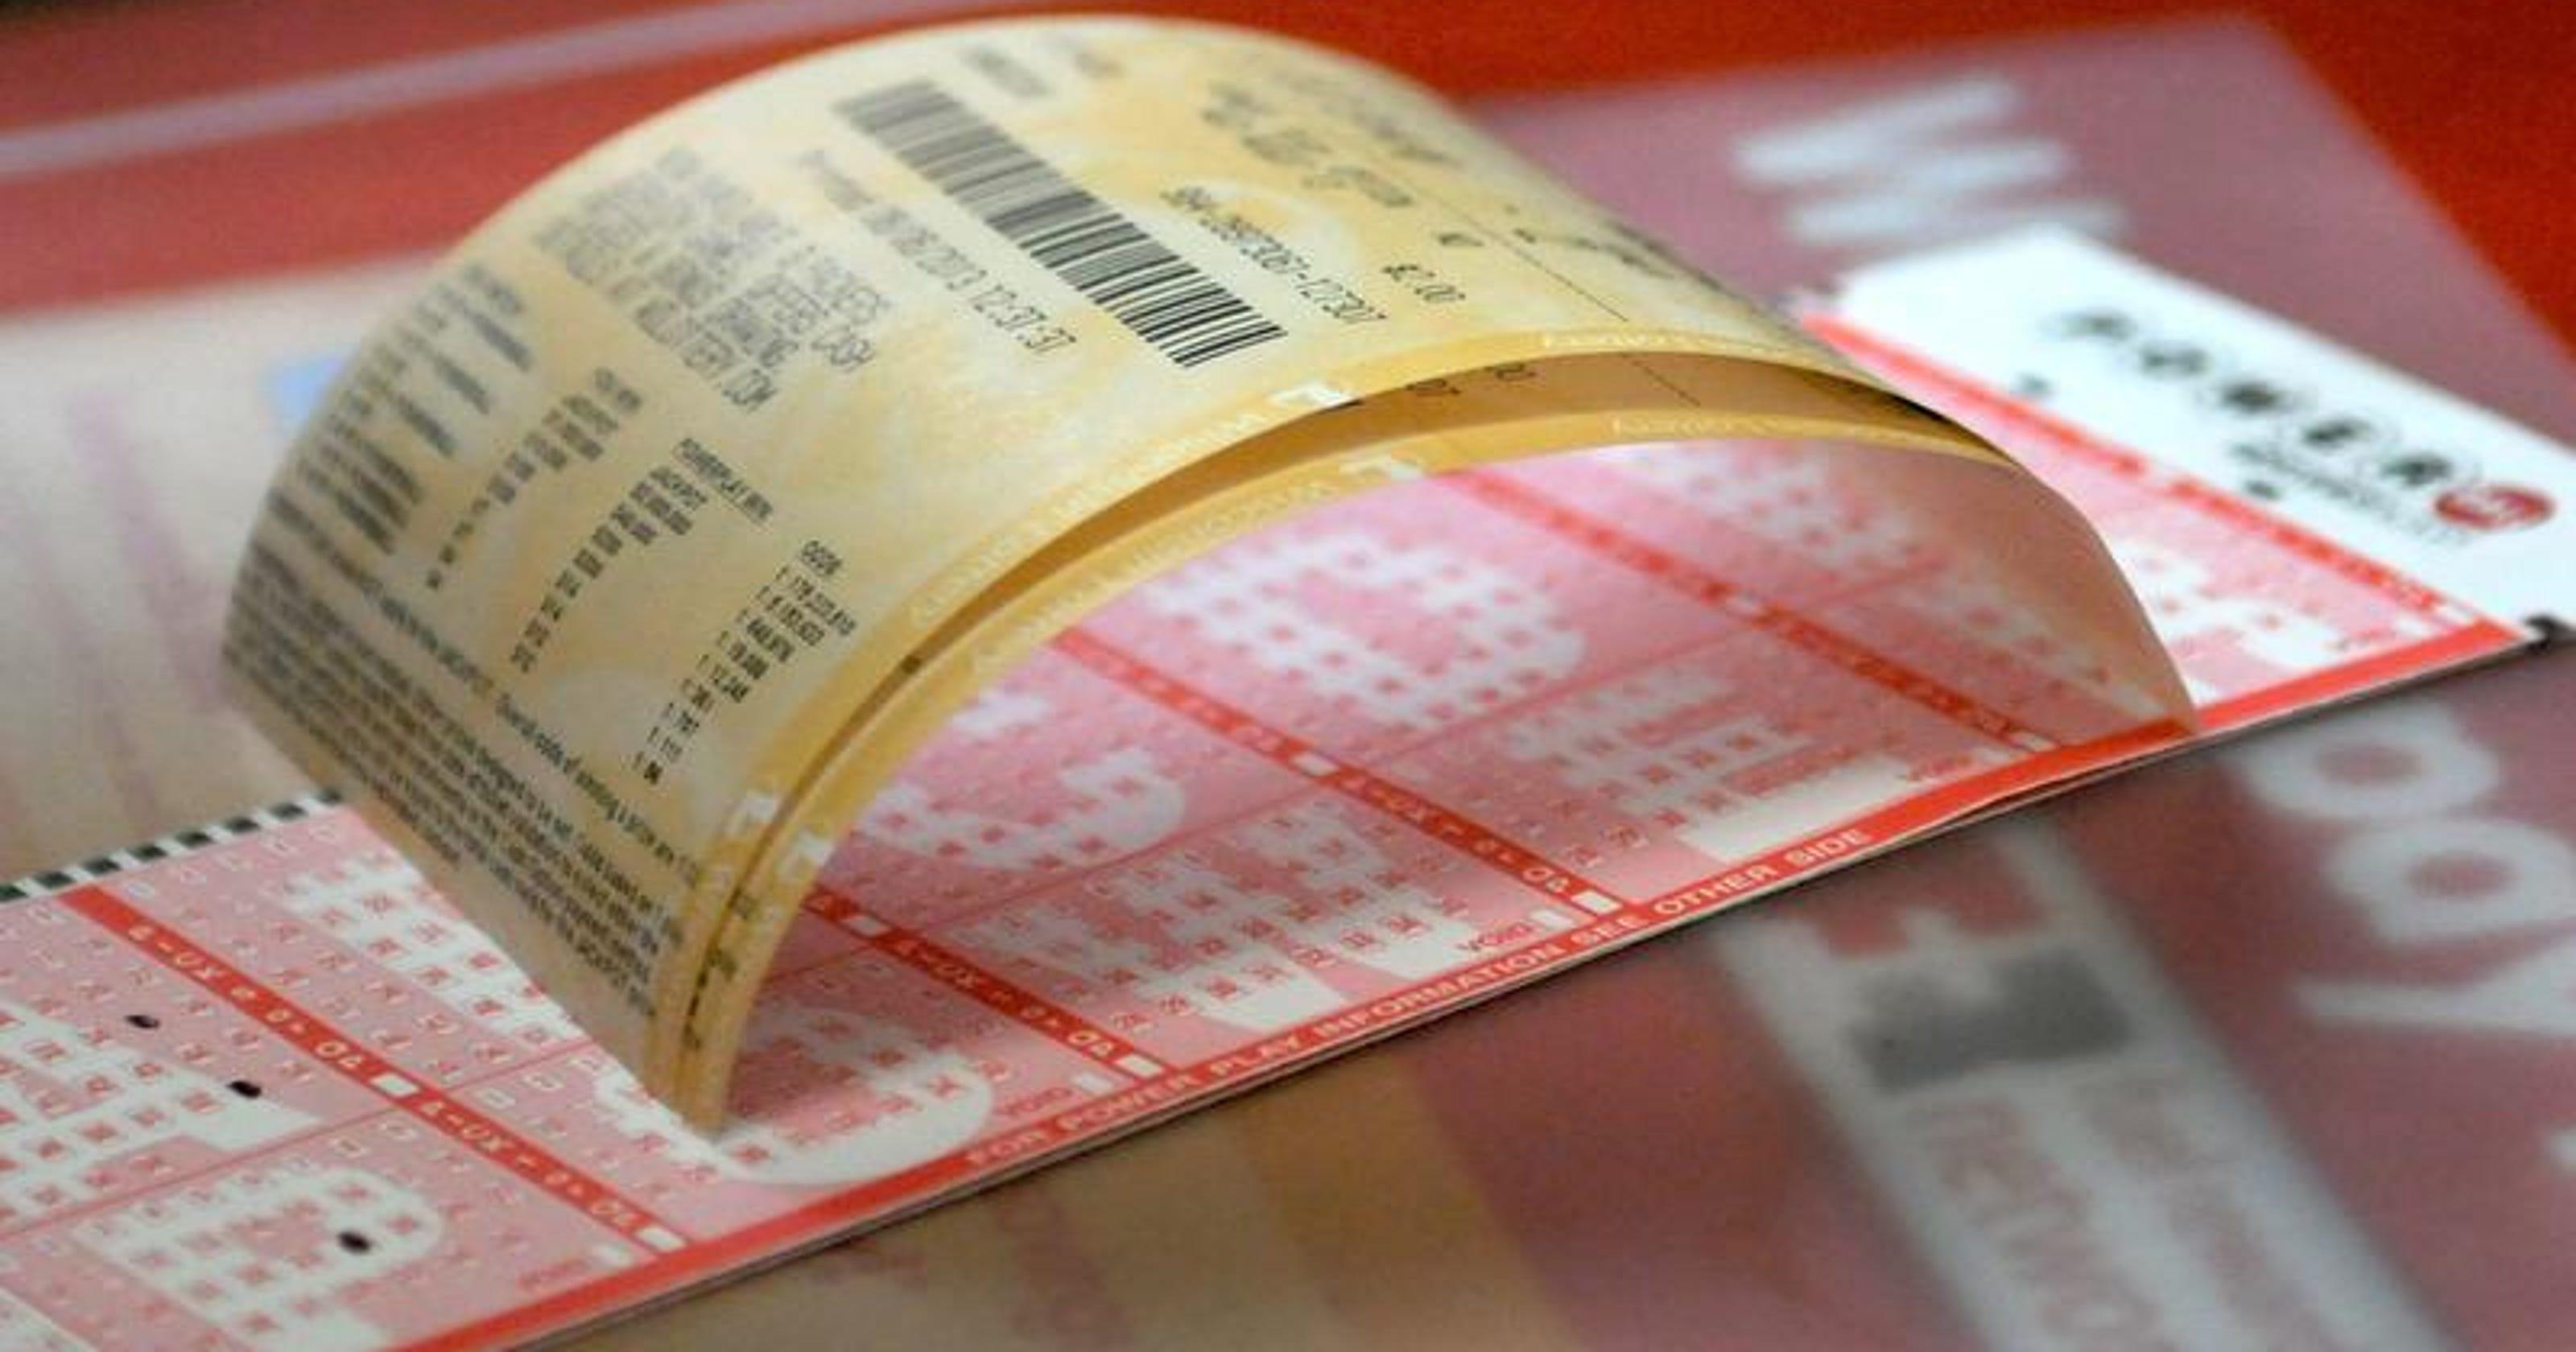 Wisconsin Lottery Sheboygan Minit Mart Sells Winning Powerball Ticket